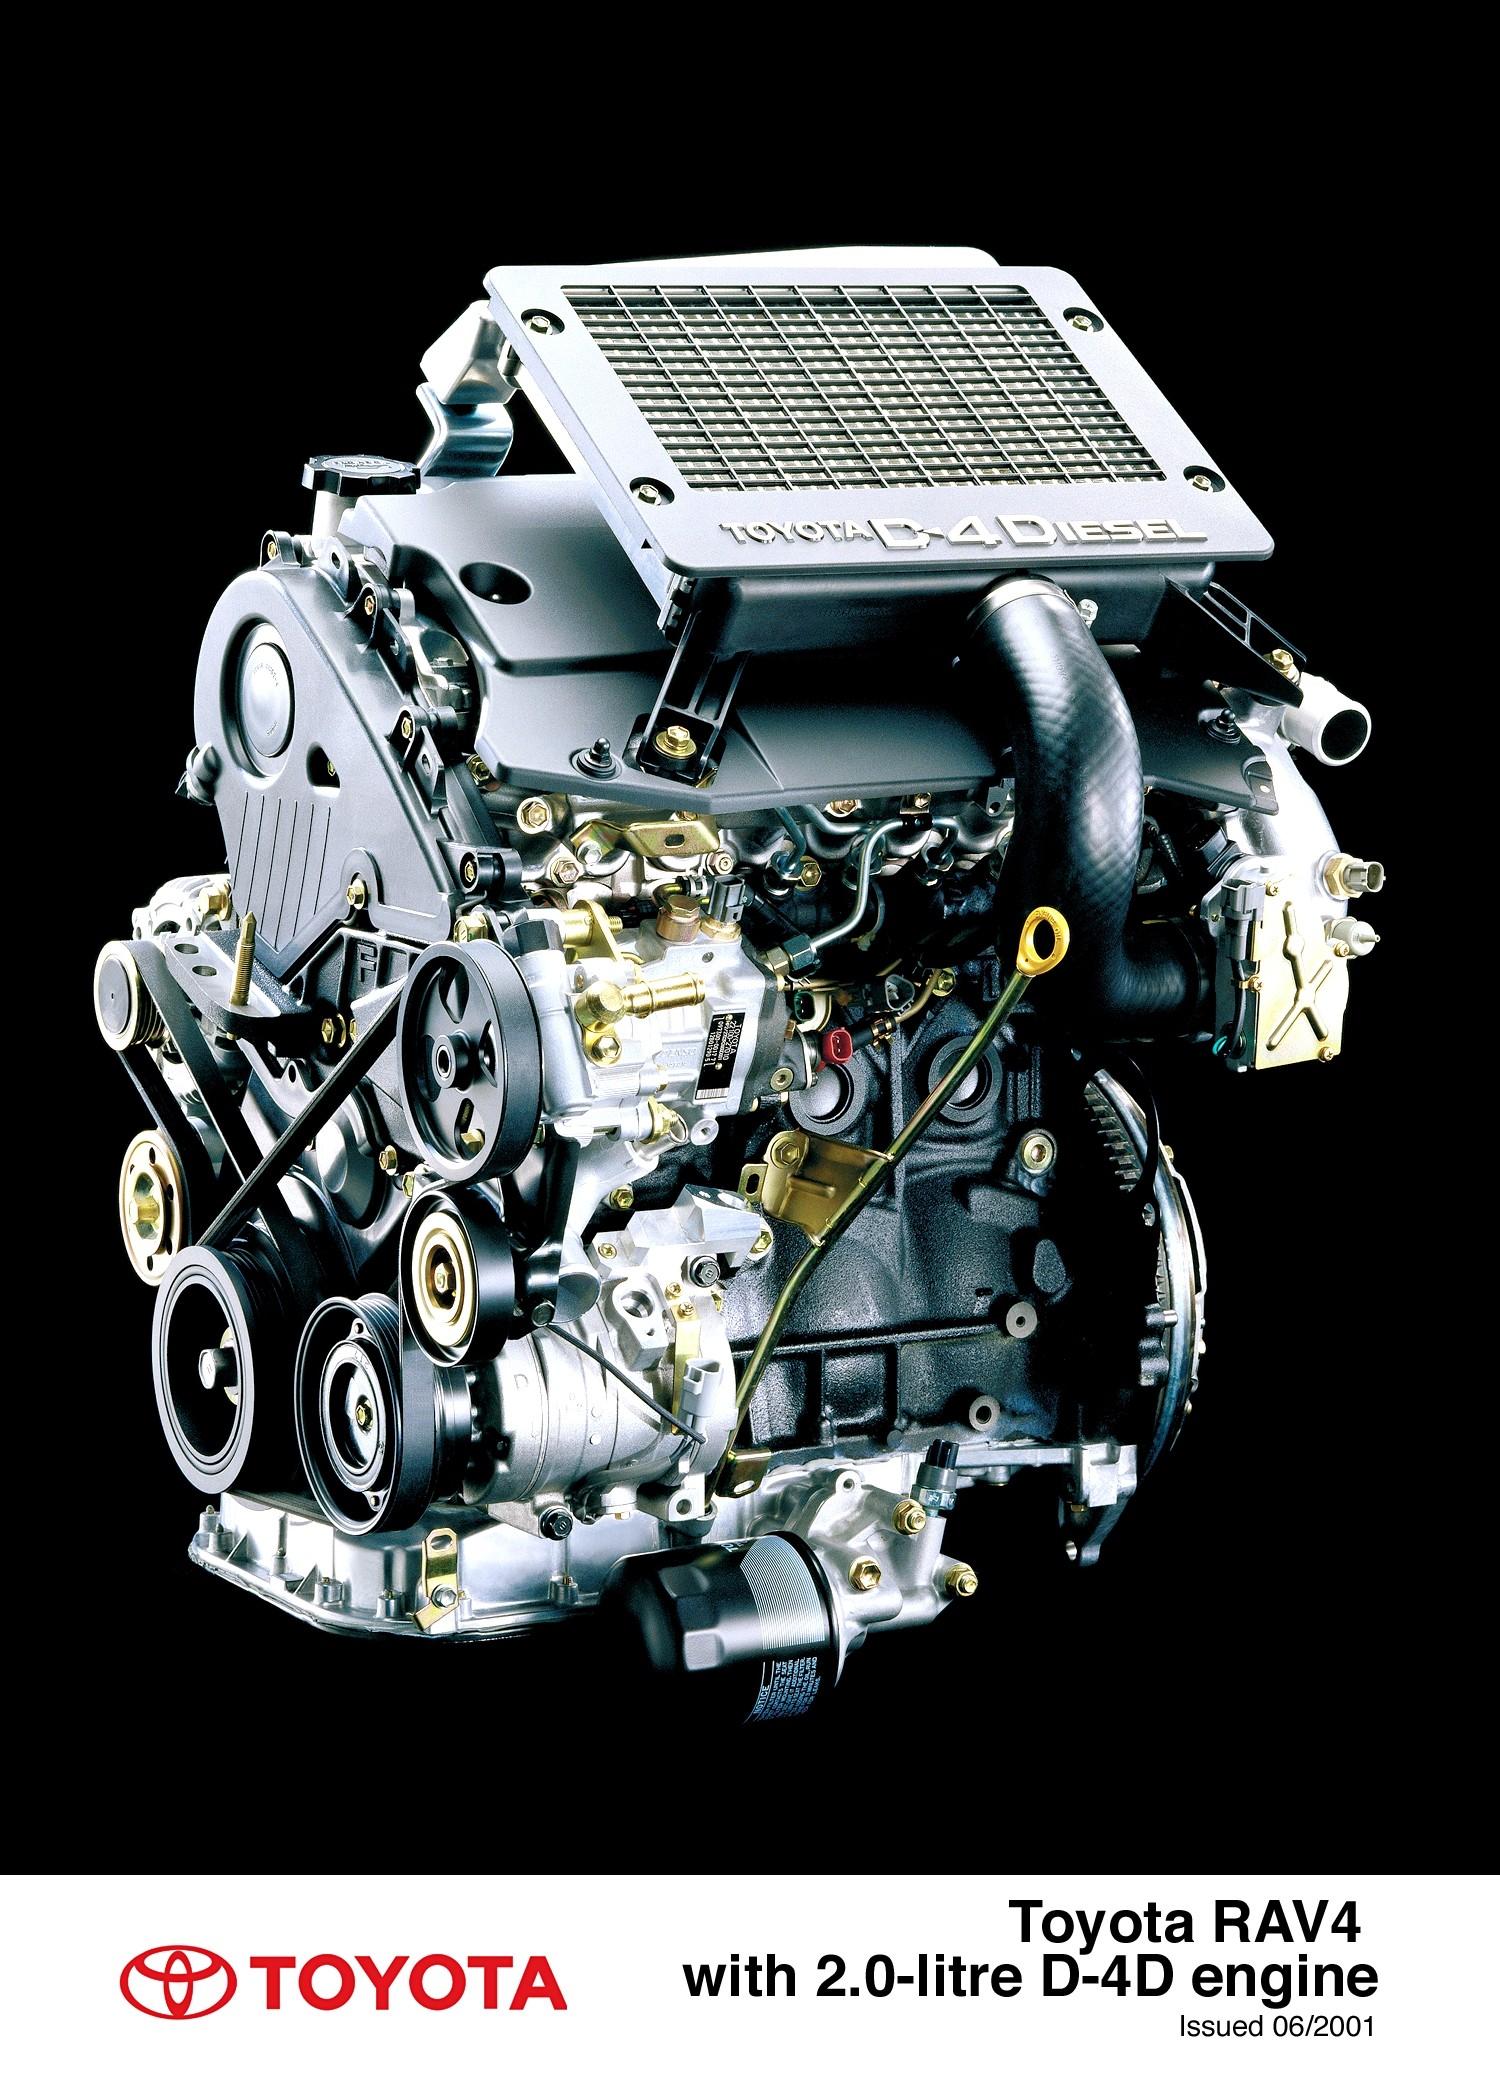 2007 Rav4 Engine Diagram toyota Launches D 4d Diesel Engine for Rav4 toyota Uk Of 2007 Rav4 Engine Diagram